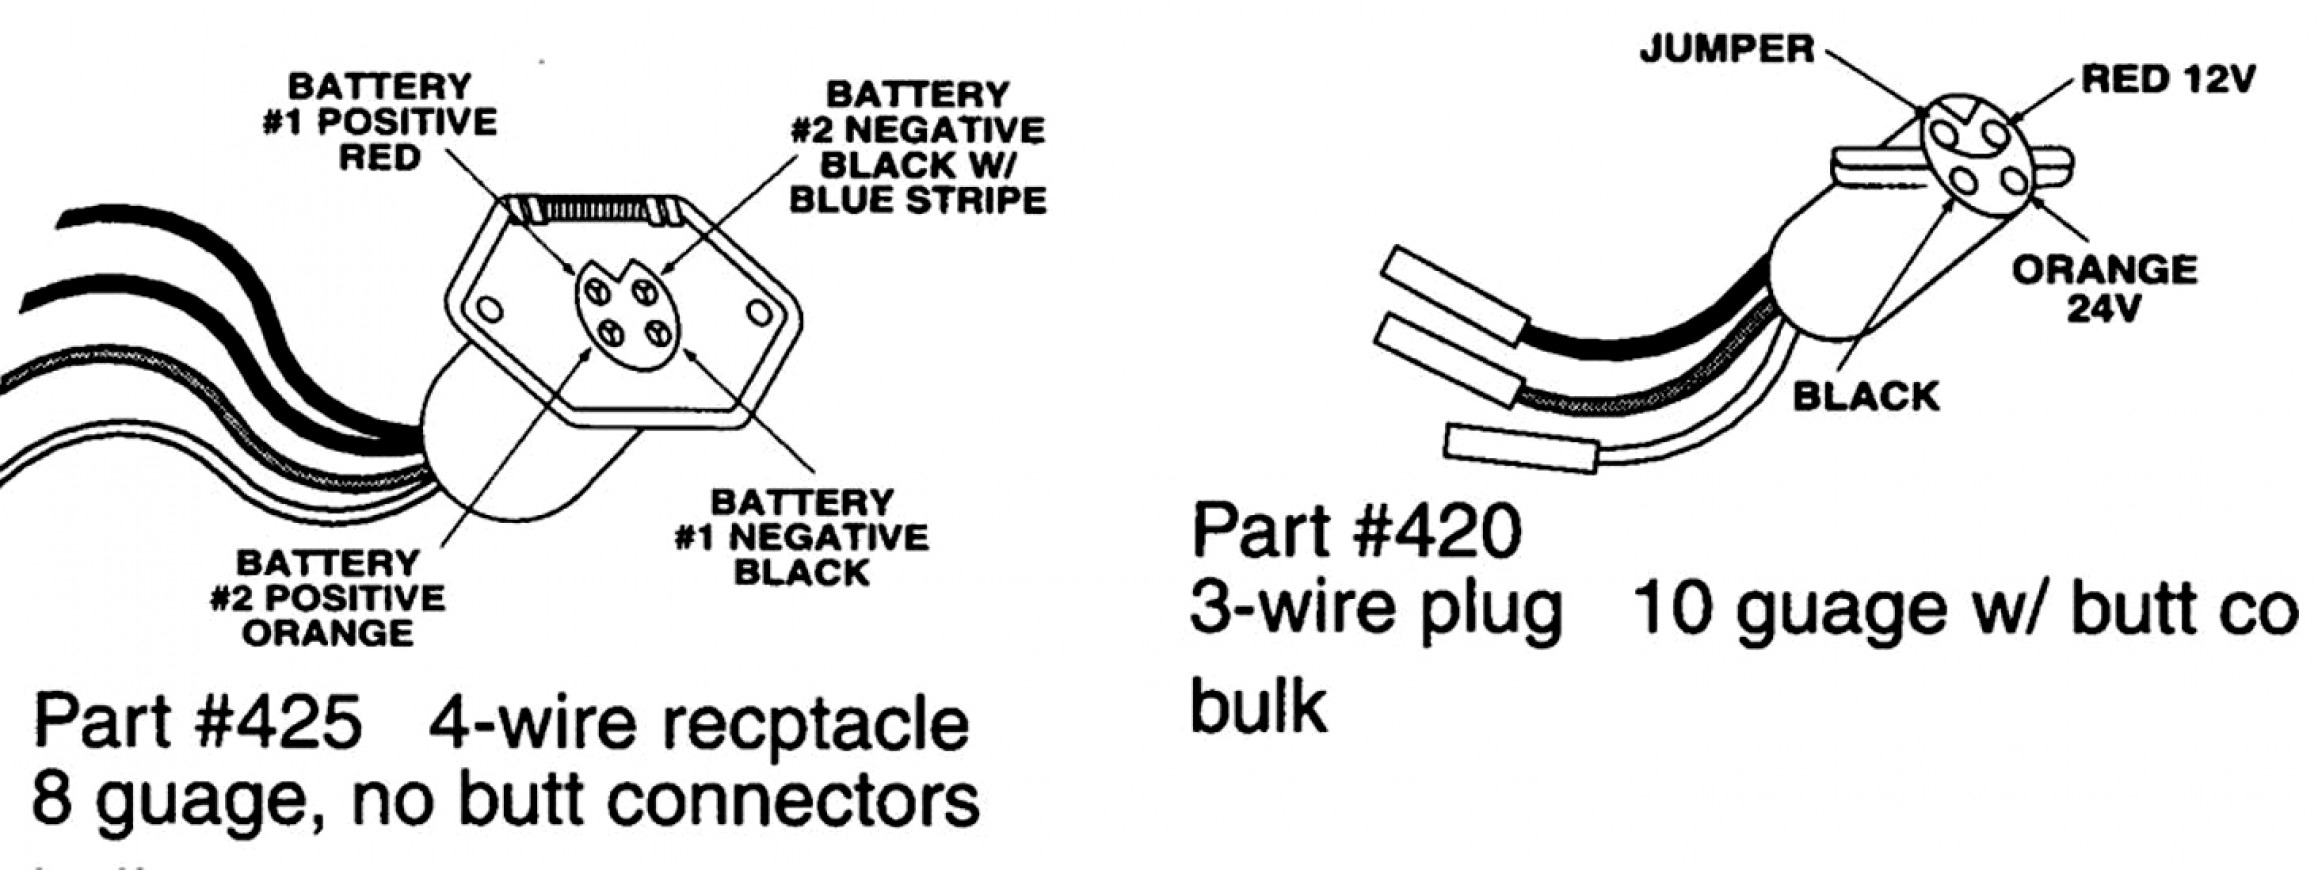 12 24 Volt Trolling Motor Wiring Diagram | Wiring Diagram - Trolling Motor Wiring Diagram